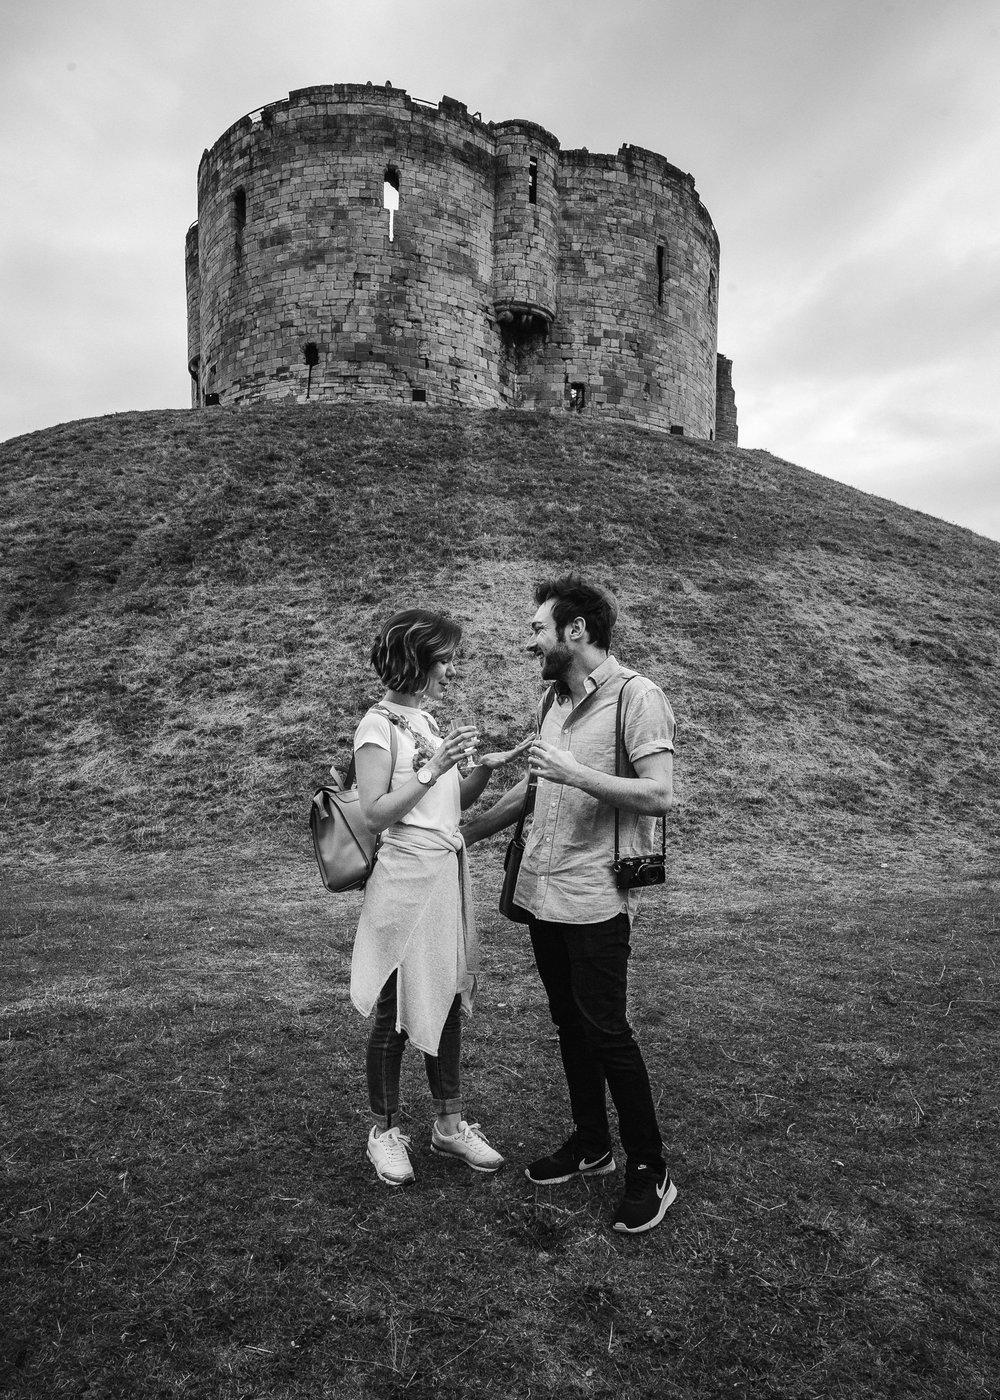 Kris-Laura-Engagement-By-Adam-Enock-20180803-0019-Kris-Askey.jpg